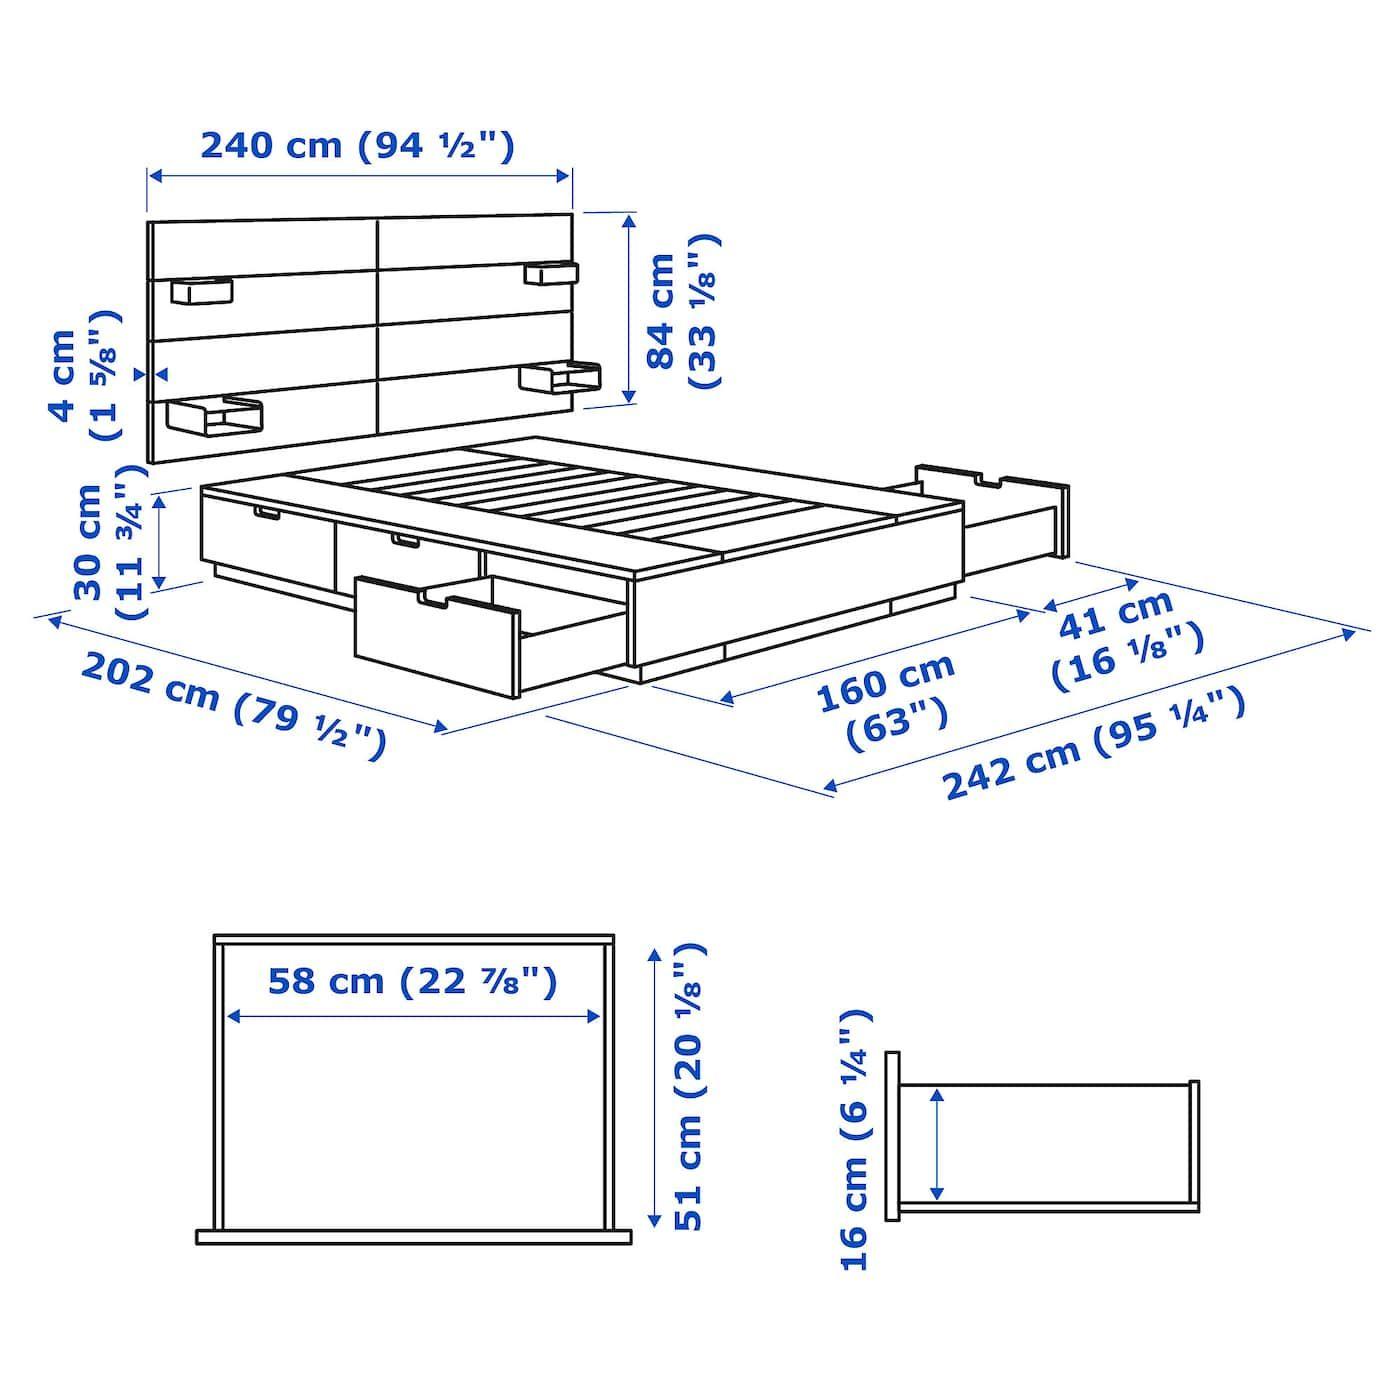 Nordli Bed With Headboard And Storage Anthracite Queen Avec Images Lit Rangement Tete De Lit Avec Rangement Tete De Lit Blanche